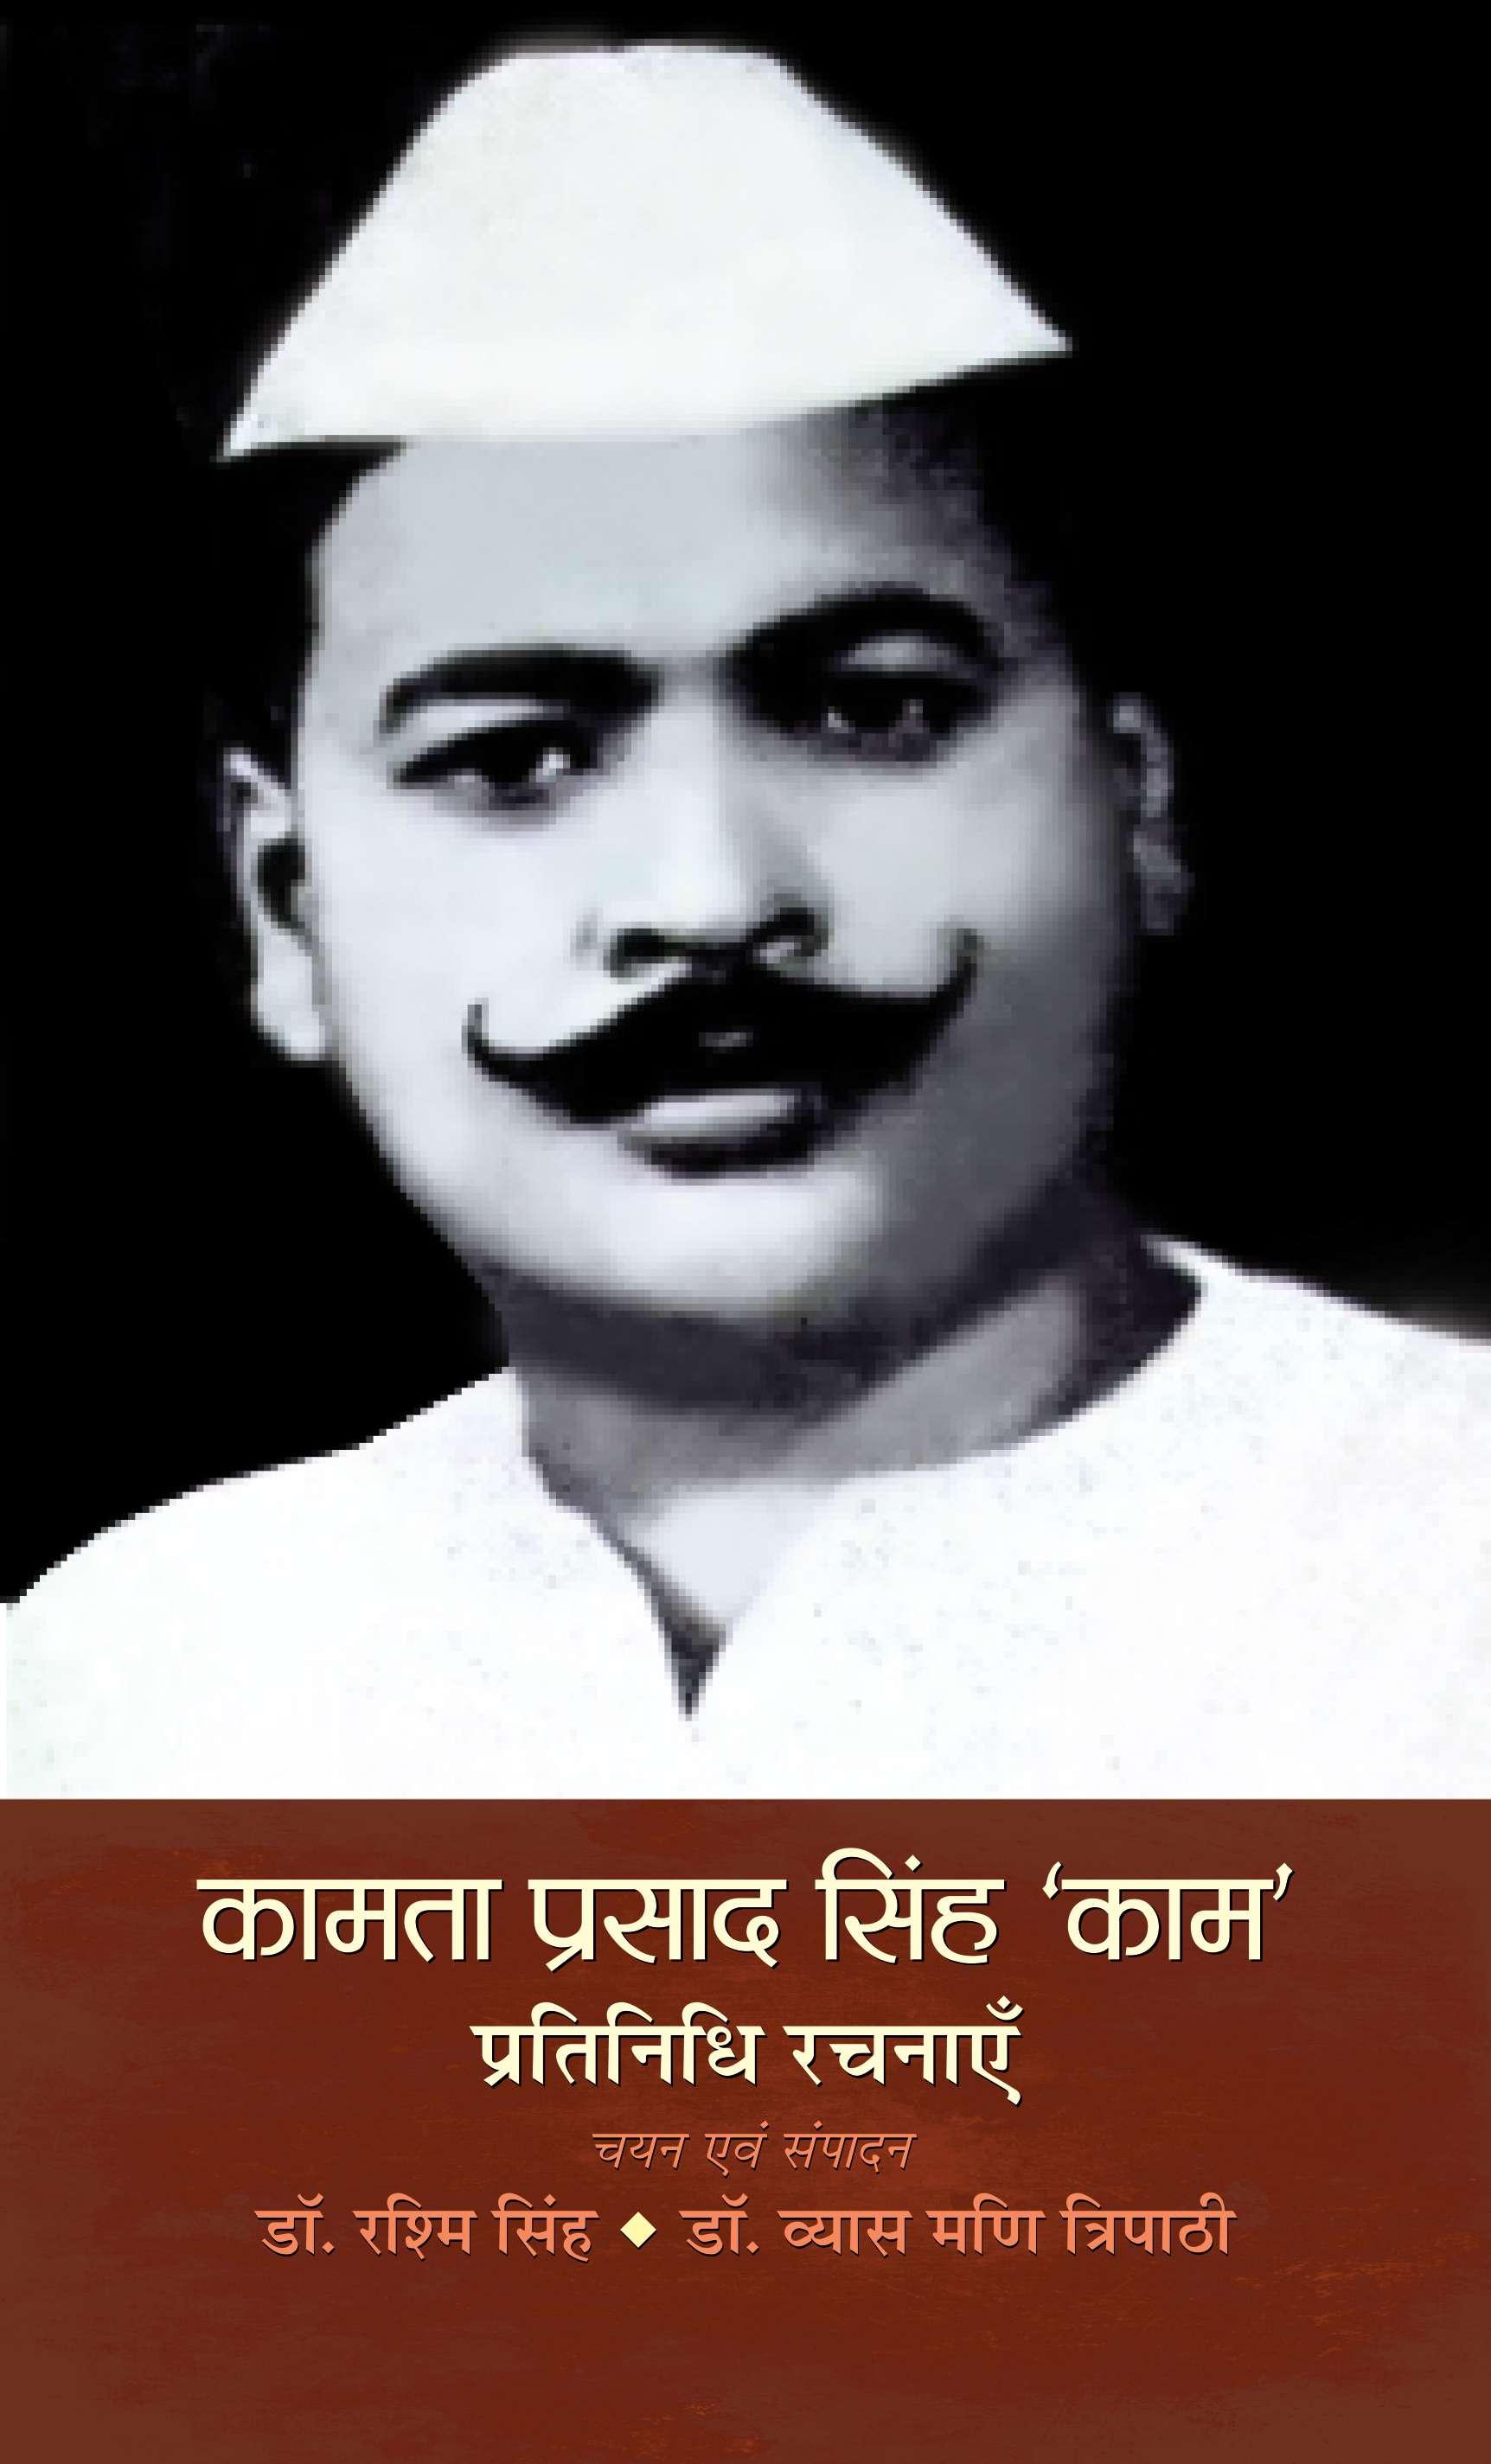 Kamta Prasad Singh 'Kaam' Pratinidhi Rachnayen